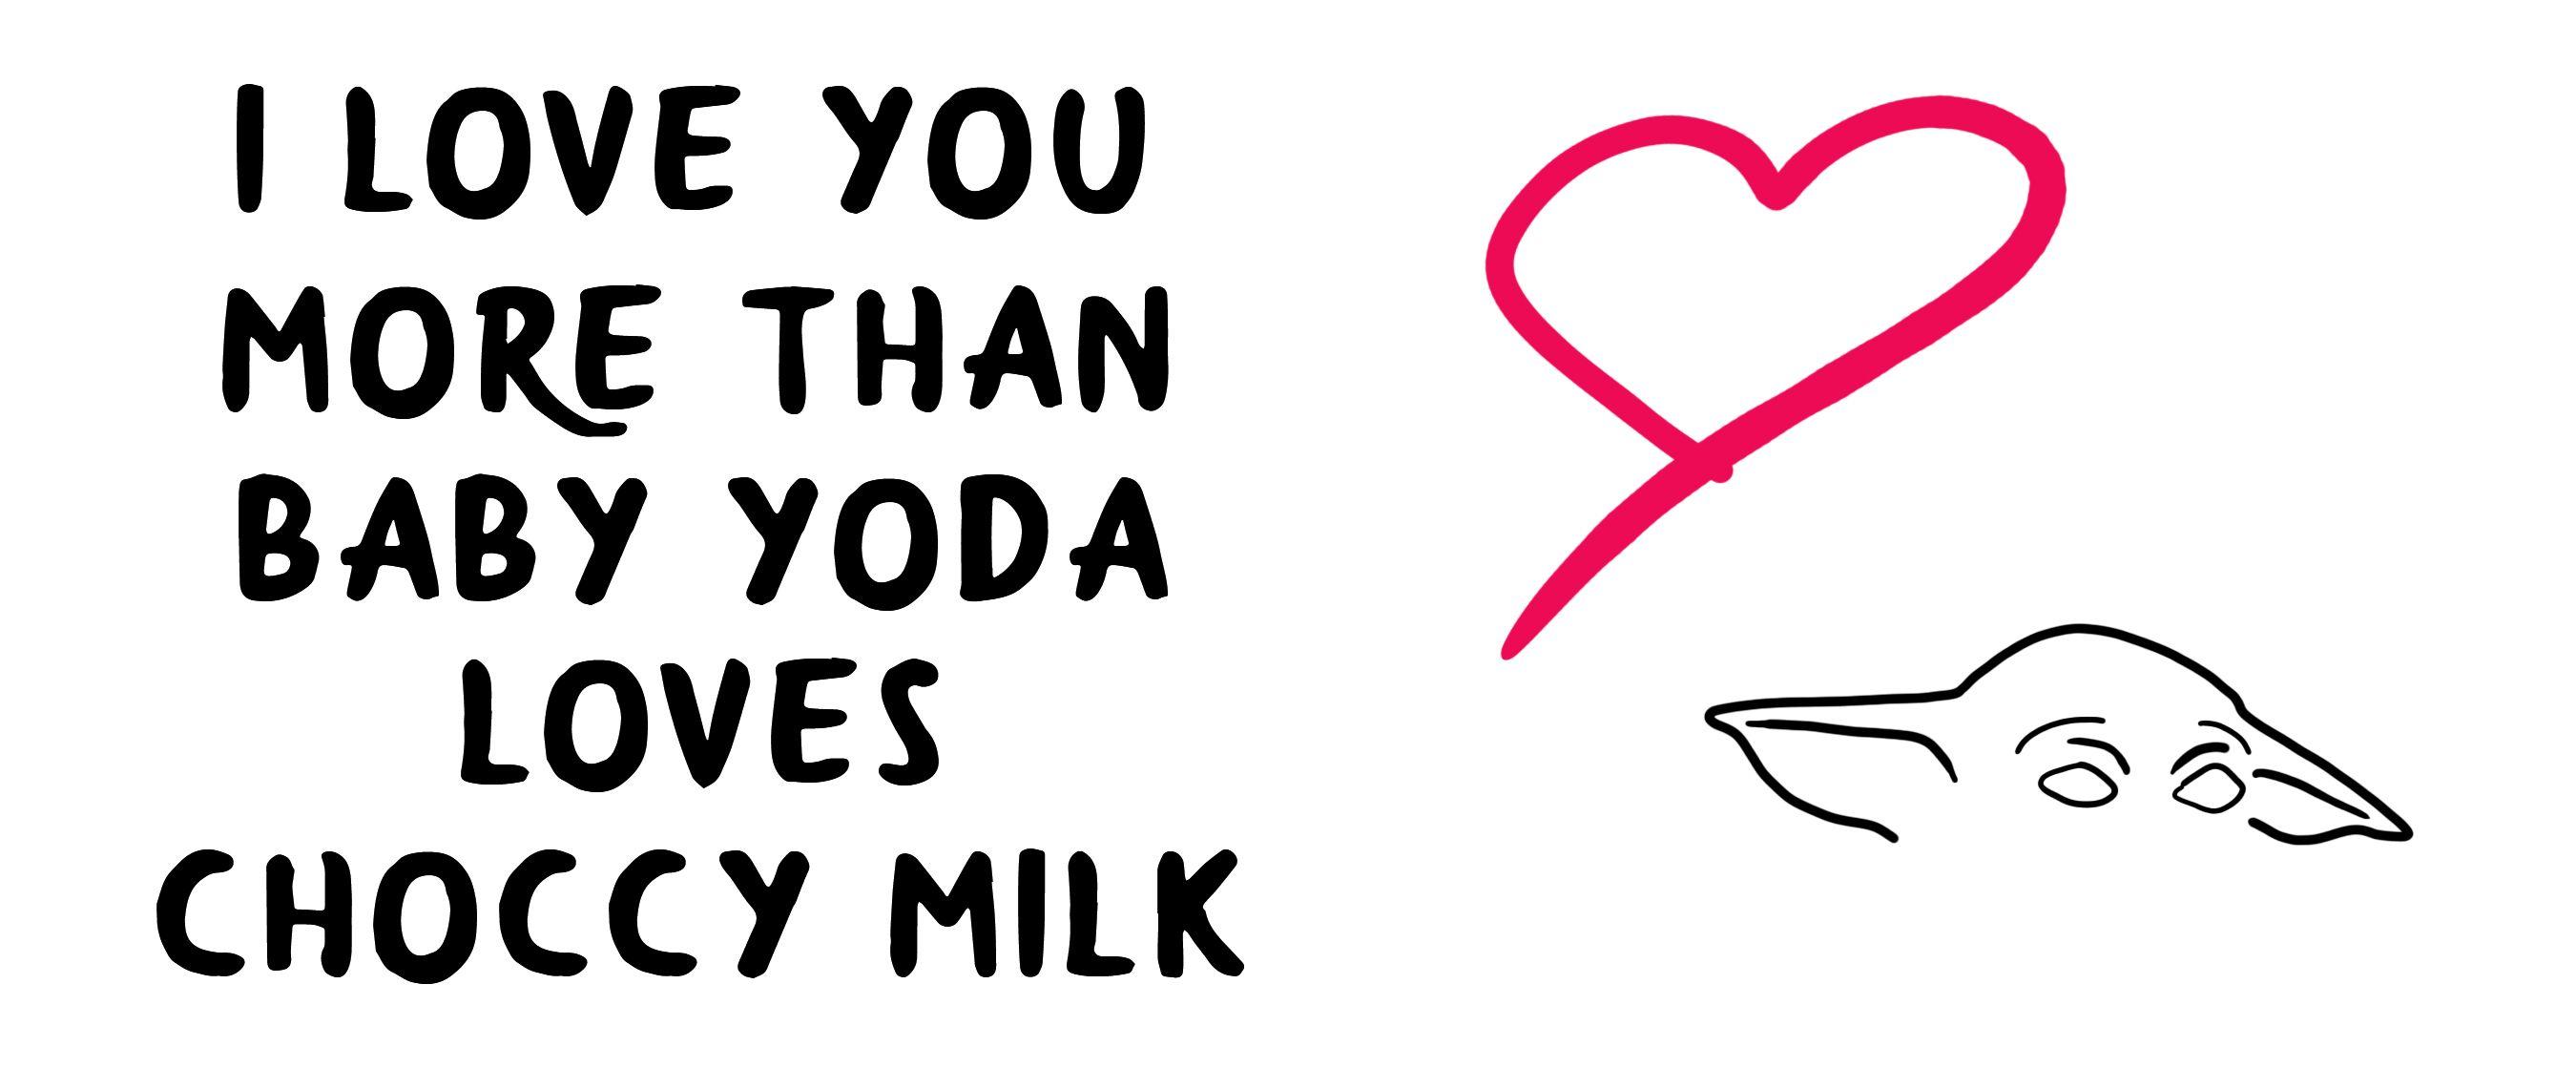 Pin By Dakota D G On Baby Yoda Yoda Pictures Yoda Funny Yoda Images